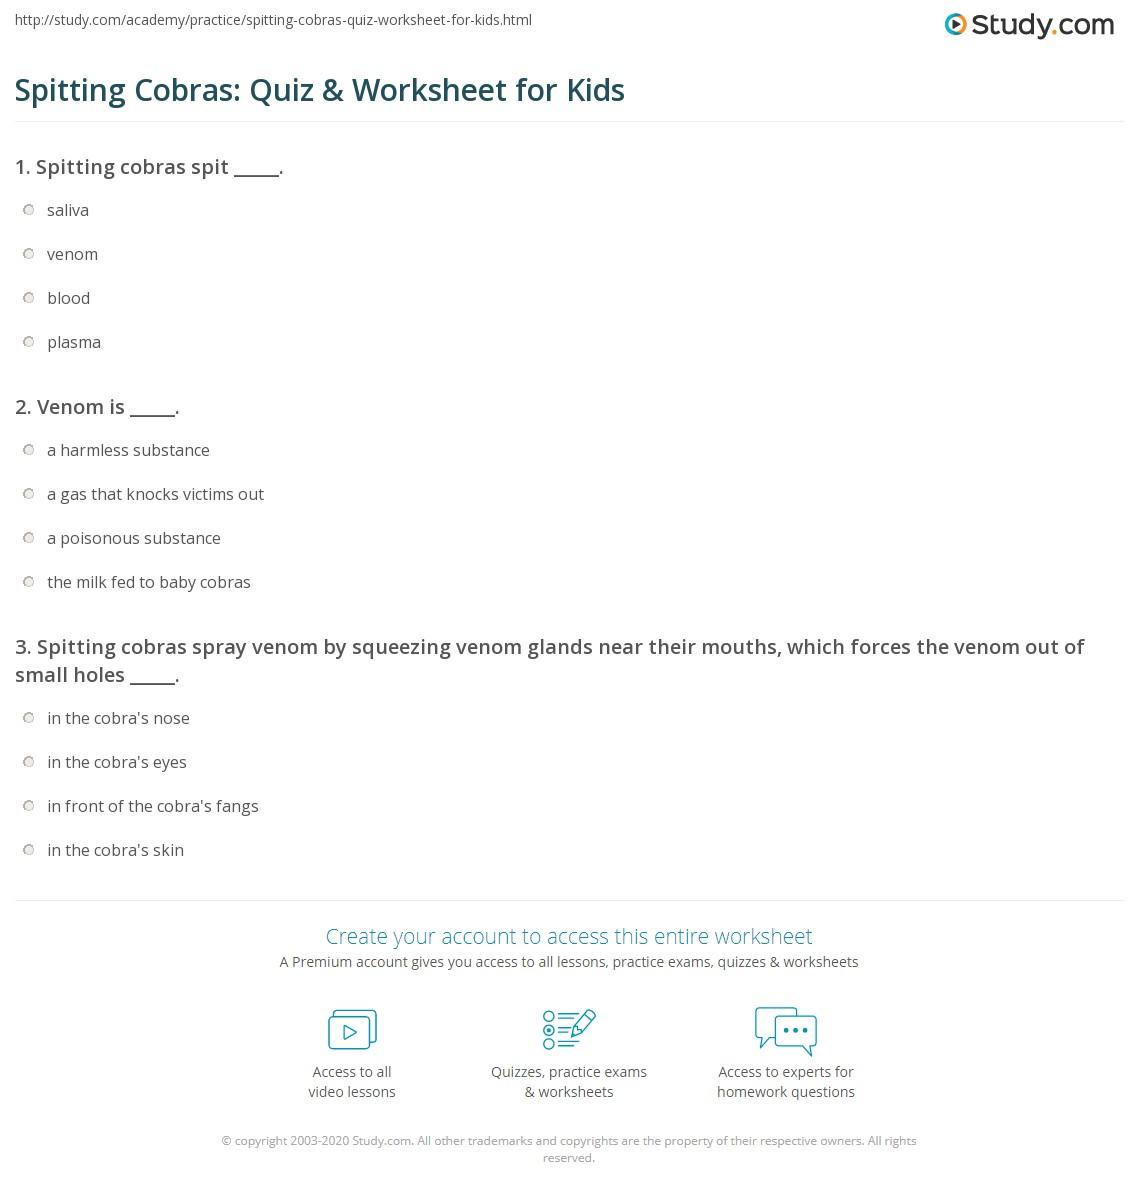 Spitting Cobras Quiz Amp Worksheet For Kids